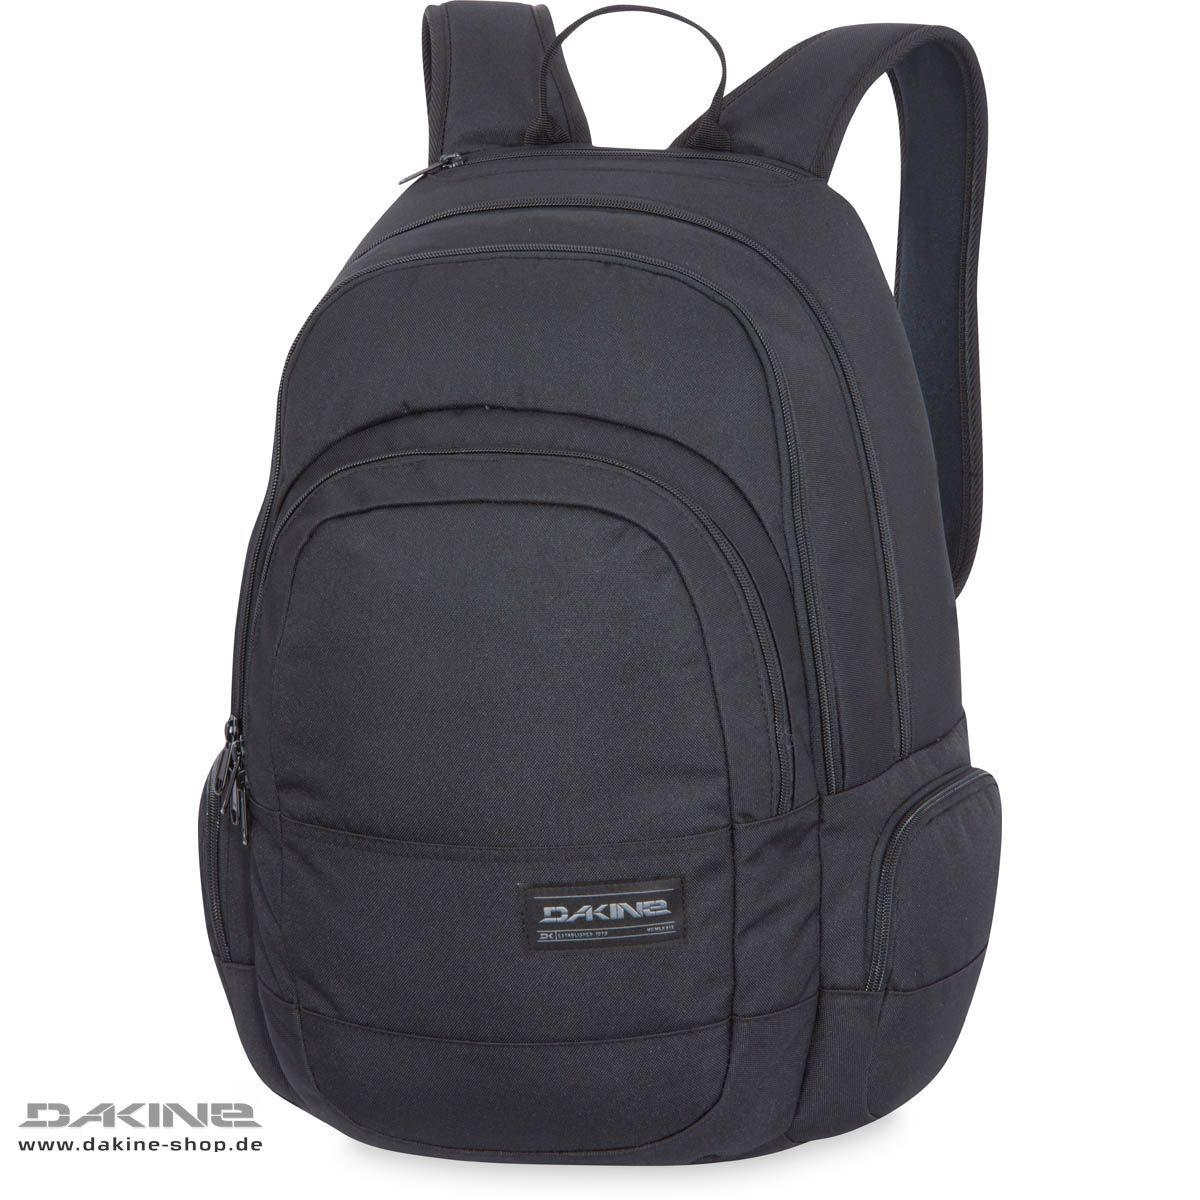 Город Рюкзак Dakine Portal Pack 32L Black Dakine-PORTAL-Schulrucksack-32L-Black-8140037-05BP7Z-DK14-19-0.jpg